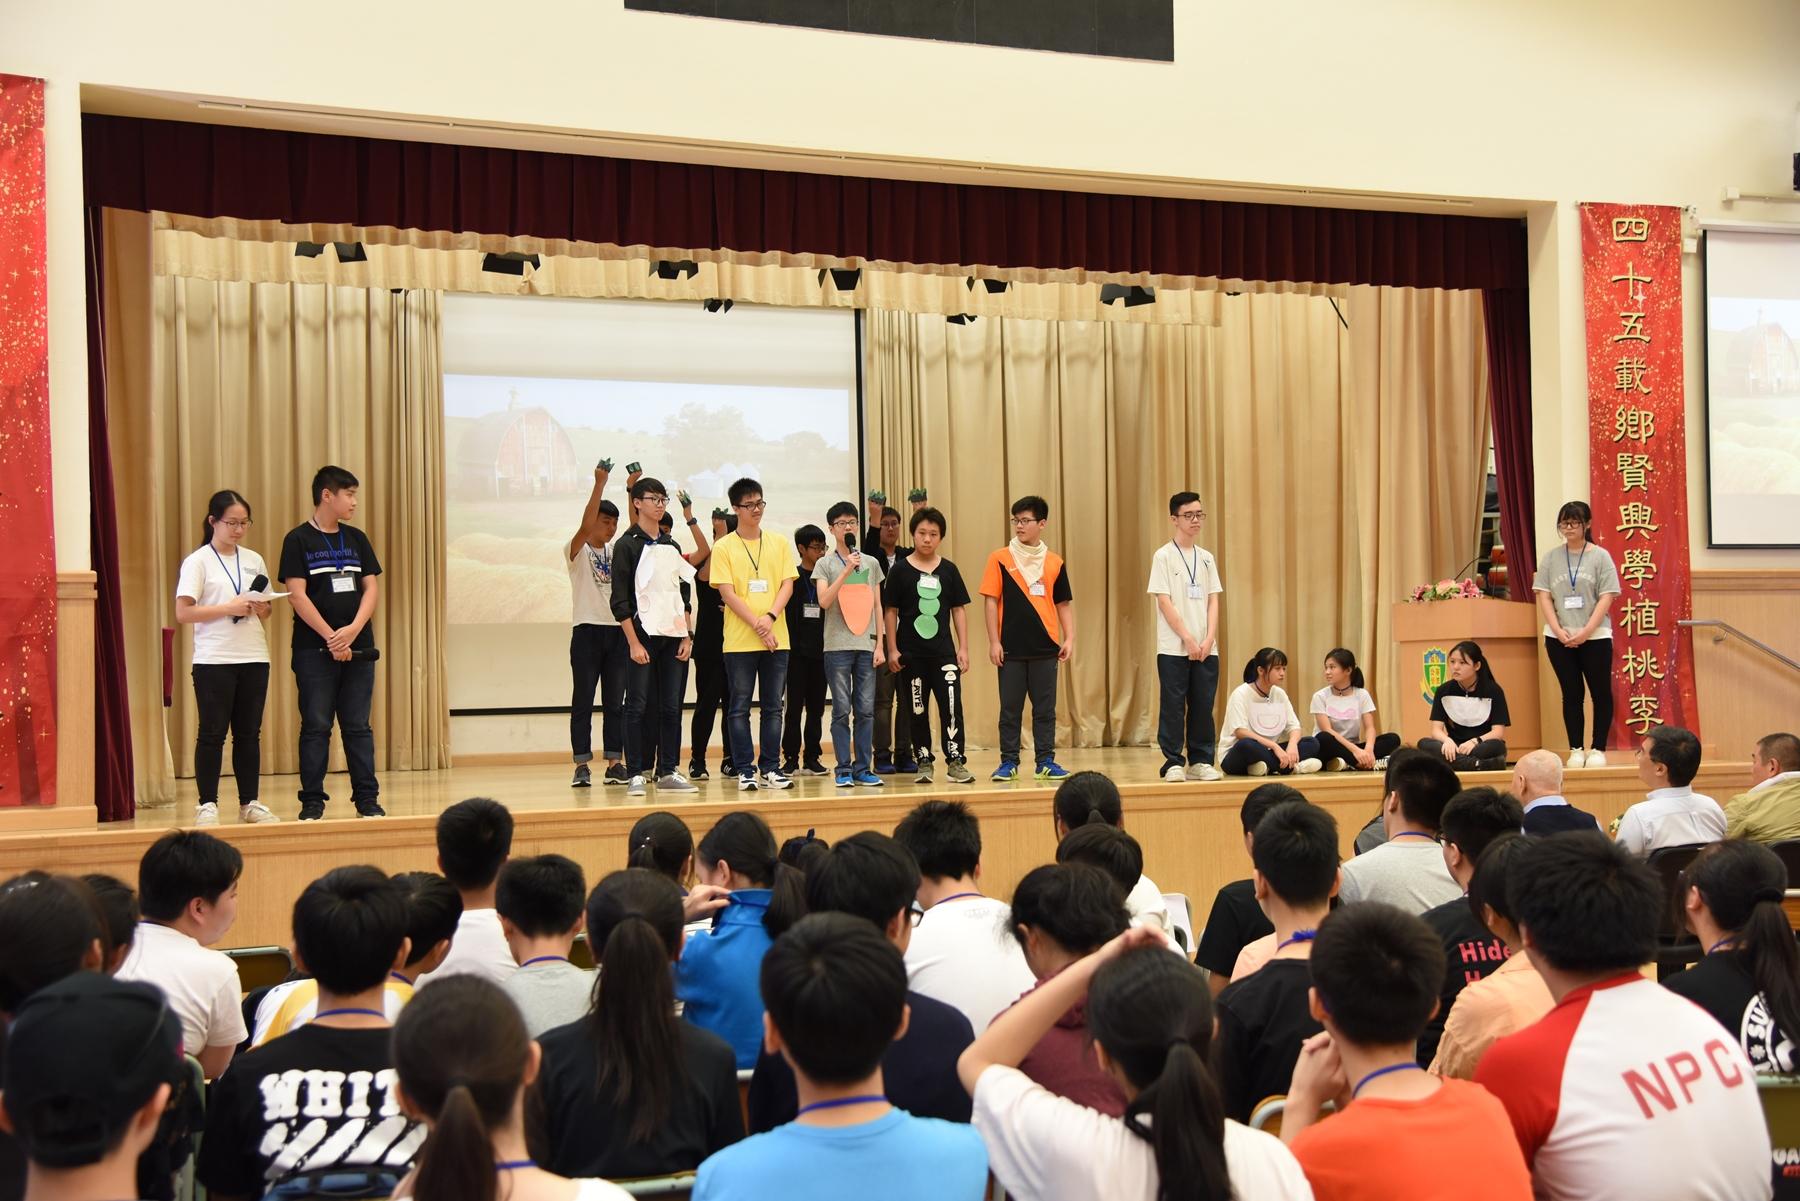 http://npc.edu.hk/sites/default/files/dsc_4586.jpg